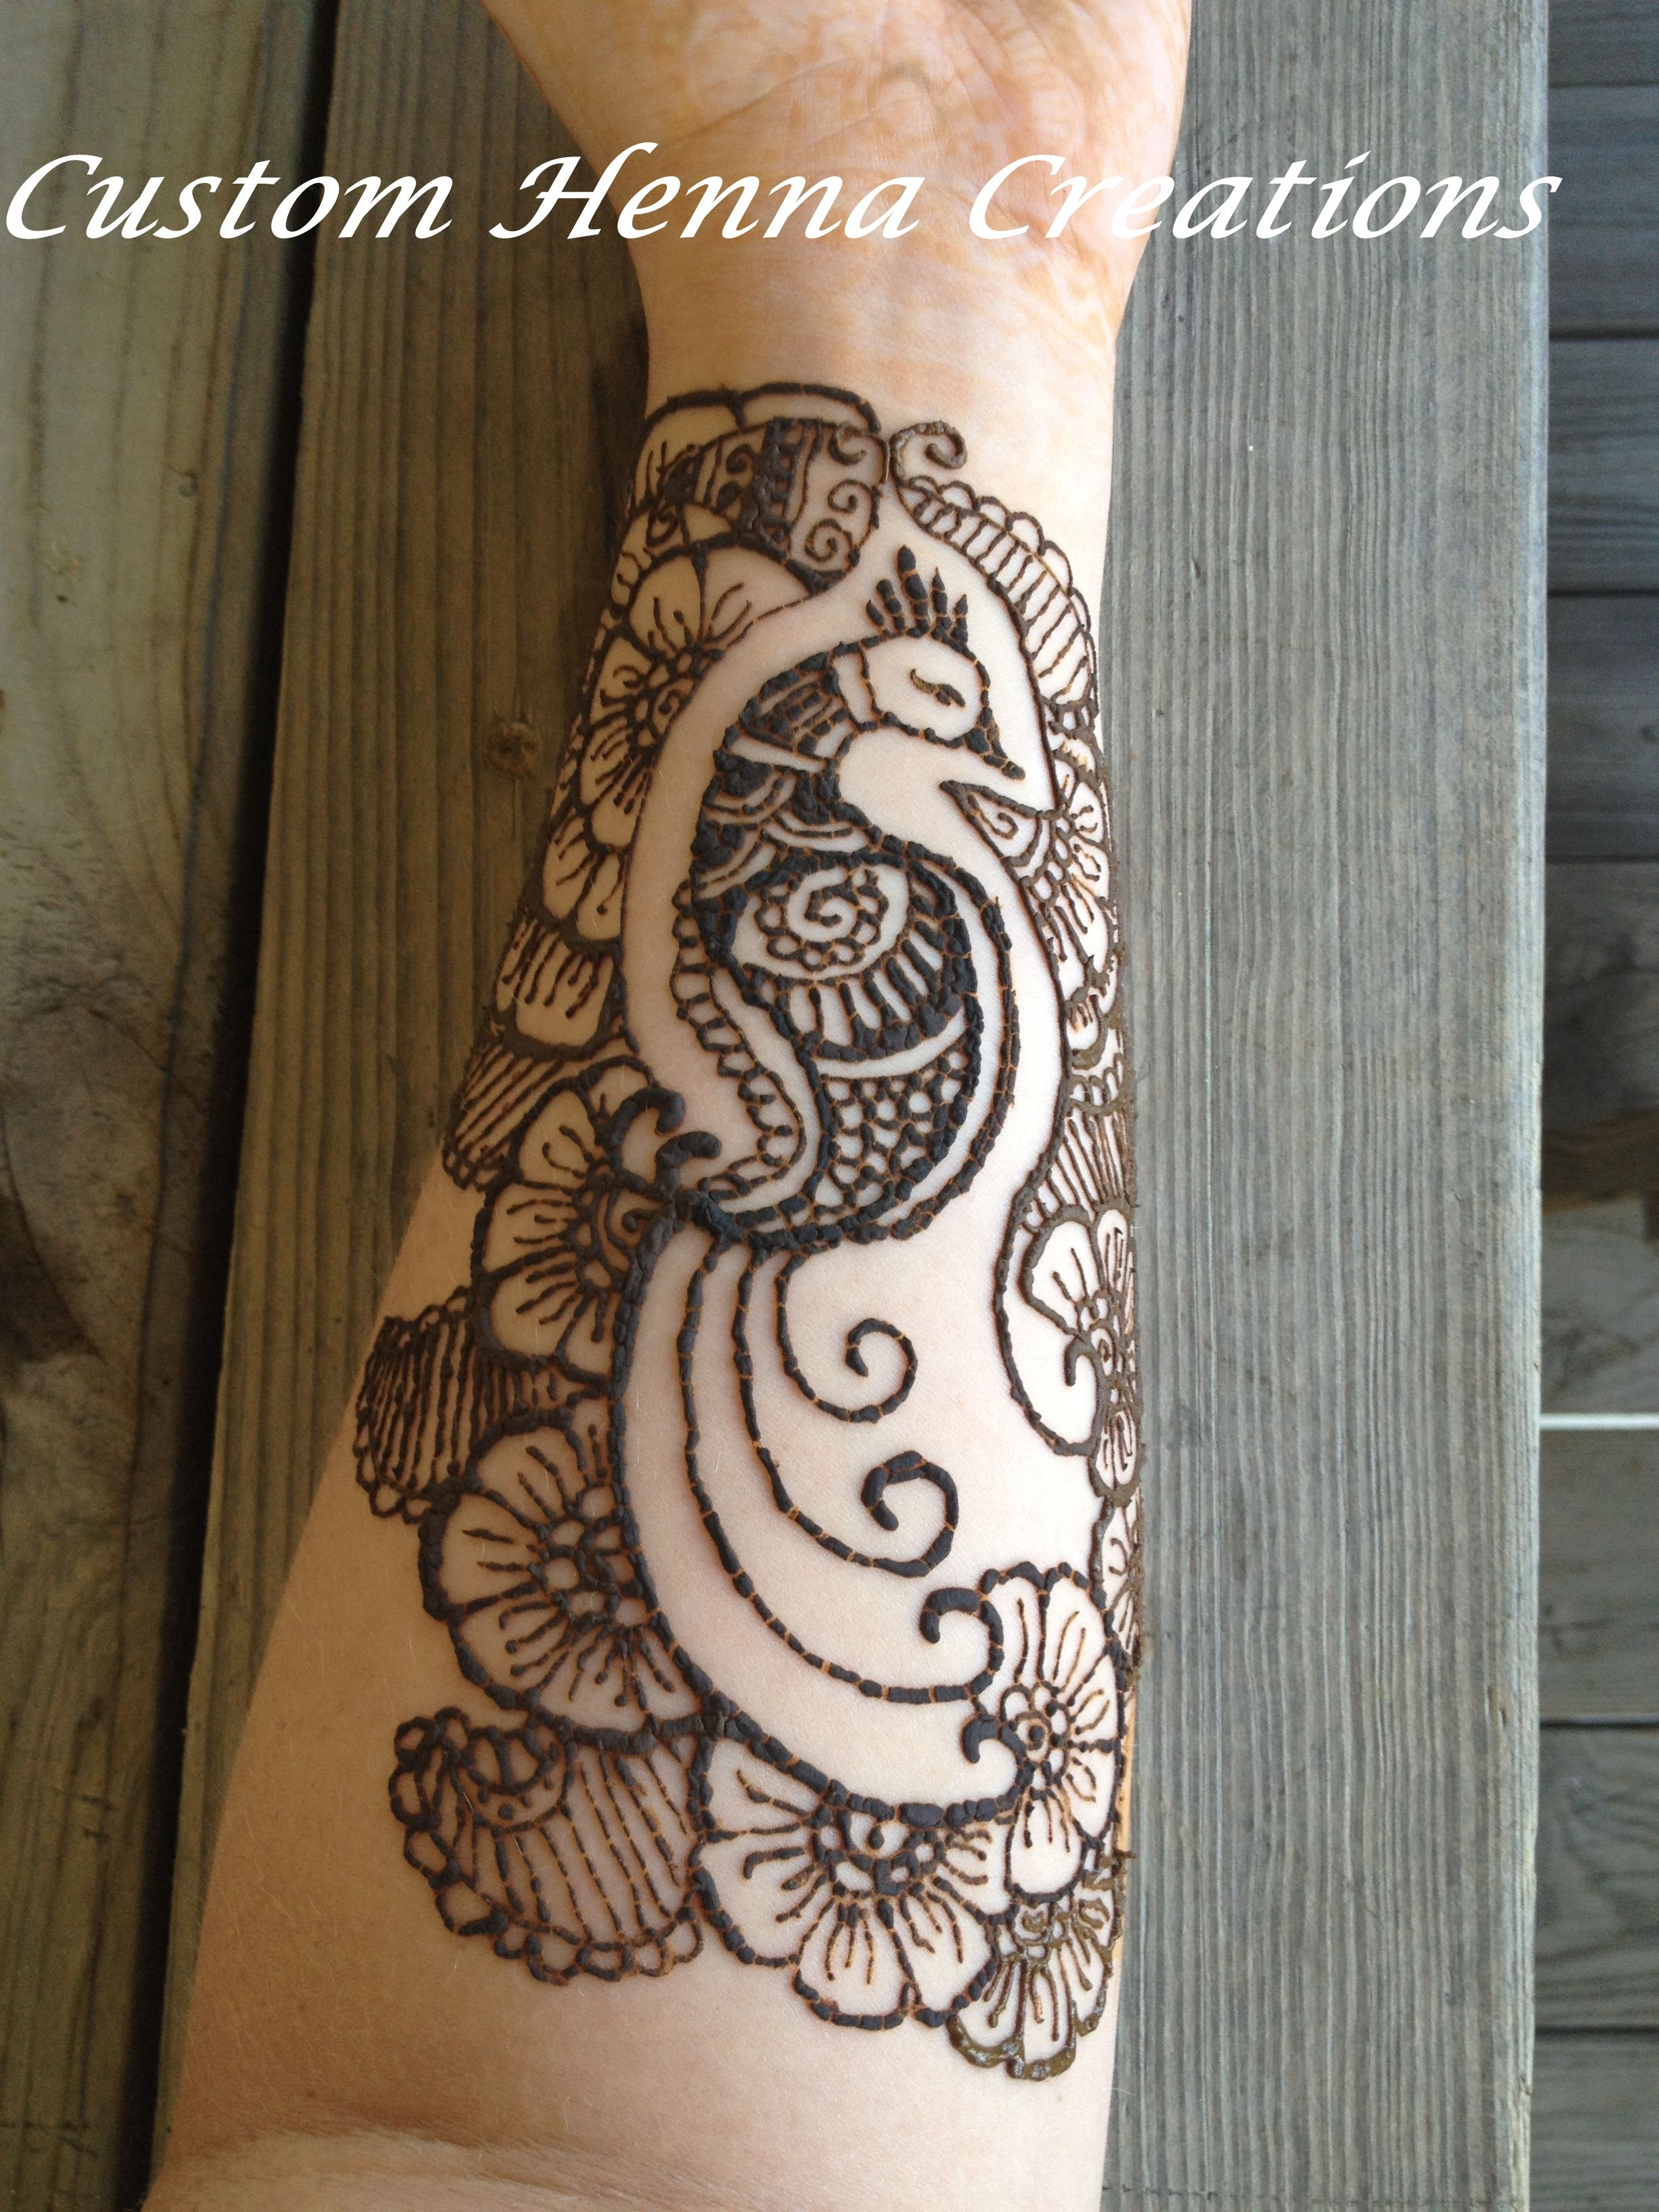 Henna On Forearm Mehndi Peacock And Flower Design Custom Henna